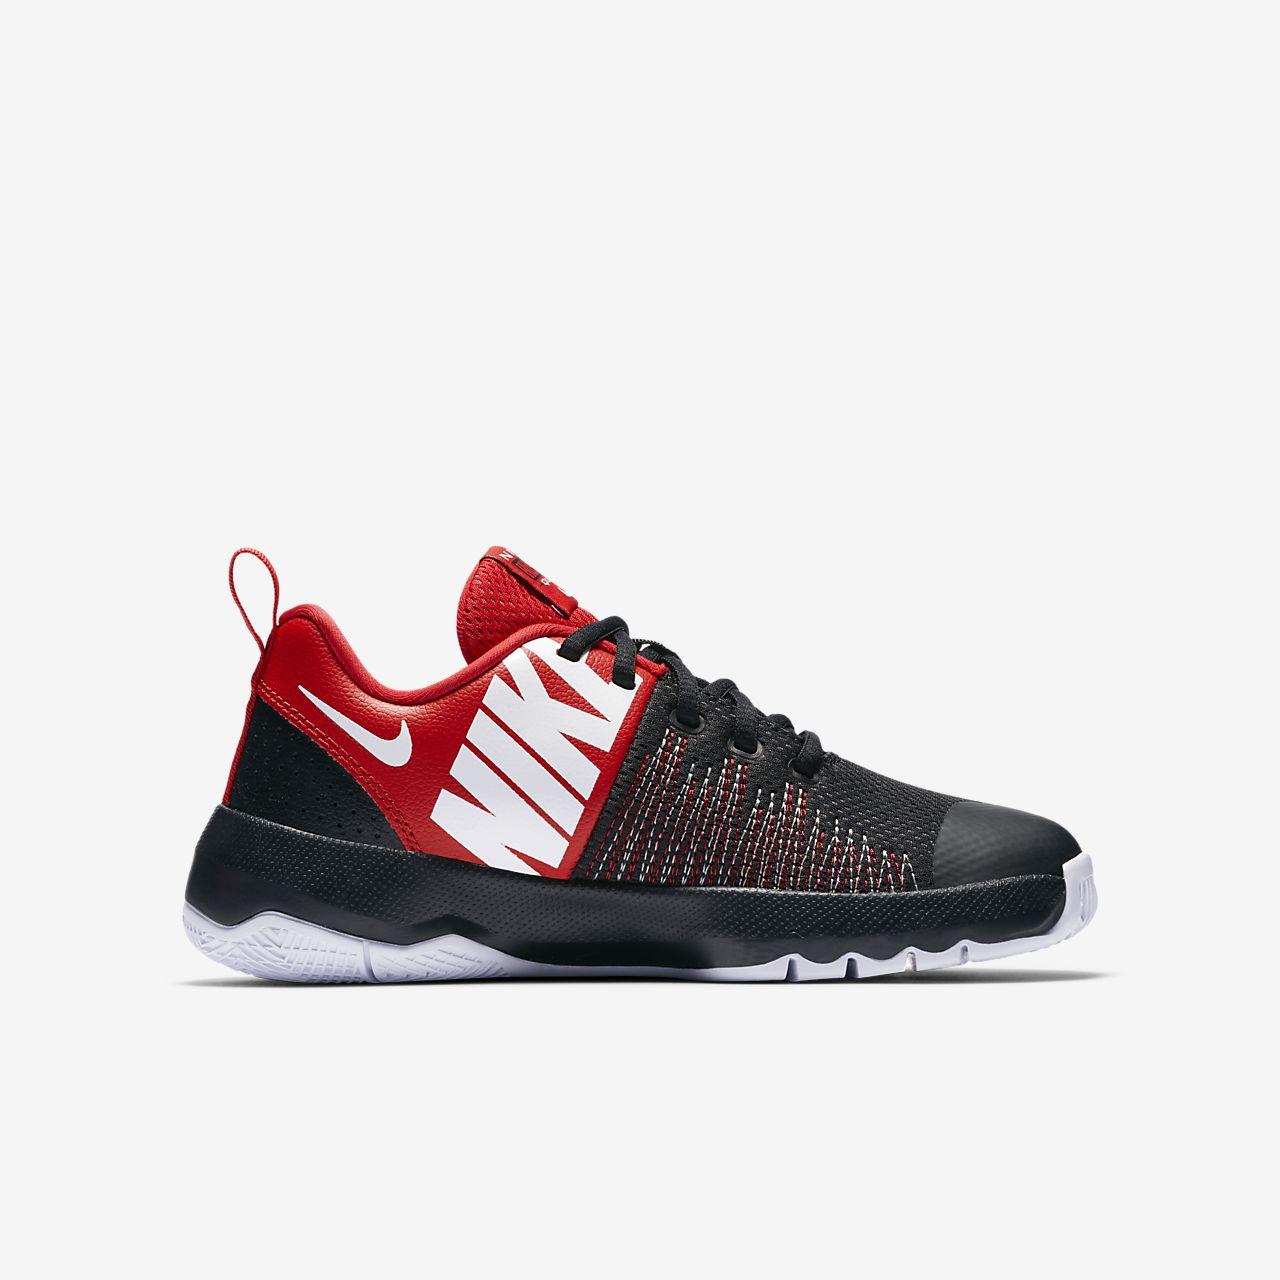 ... Nike Team Hustle Quick Big Kids' Basketball Shoe